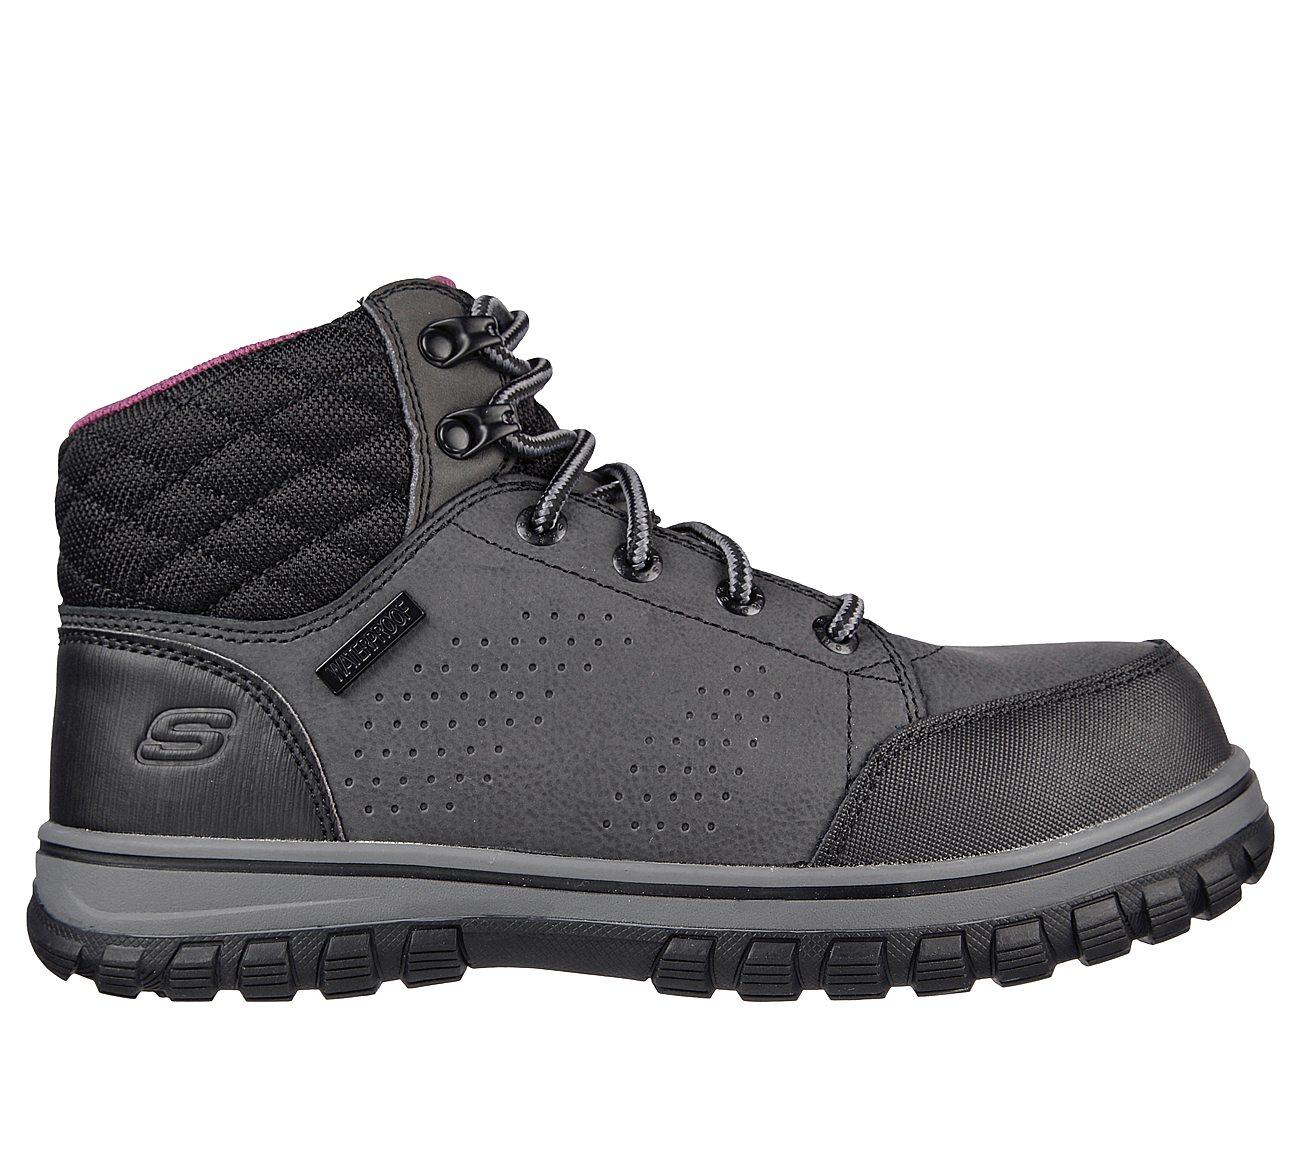 SKECHERS Work: McColl Comp Toe Work Shoes